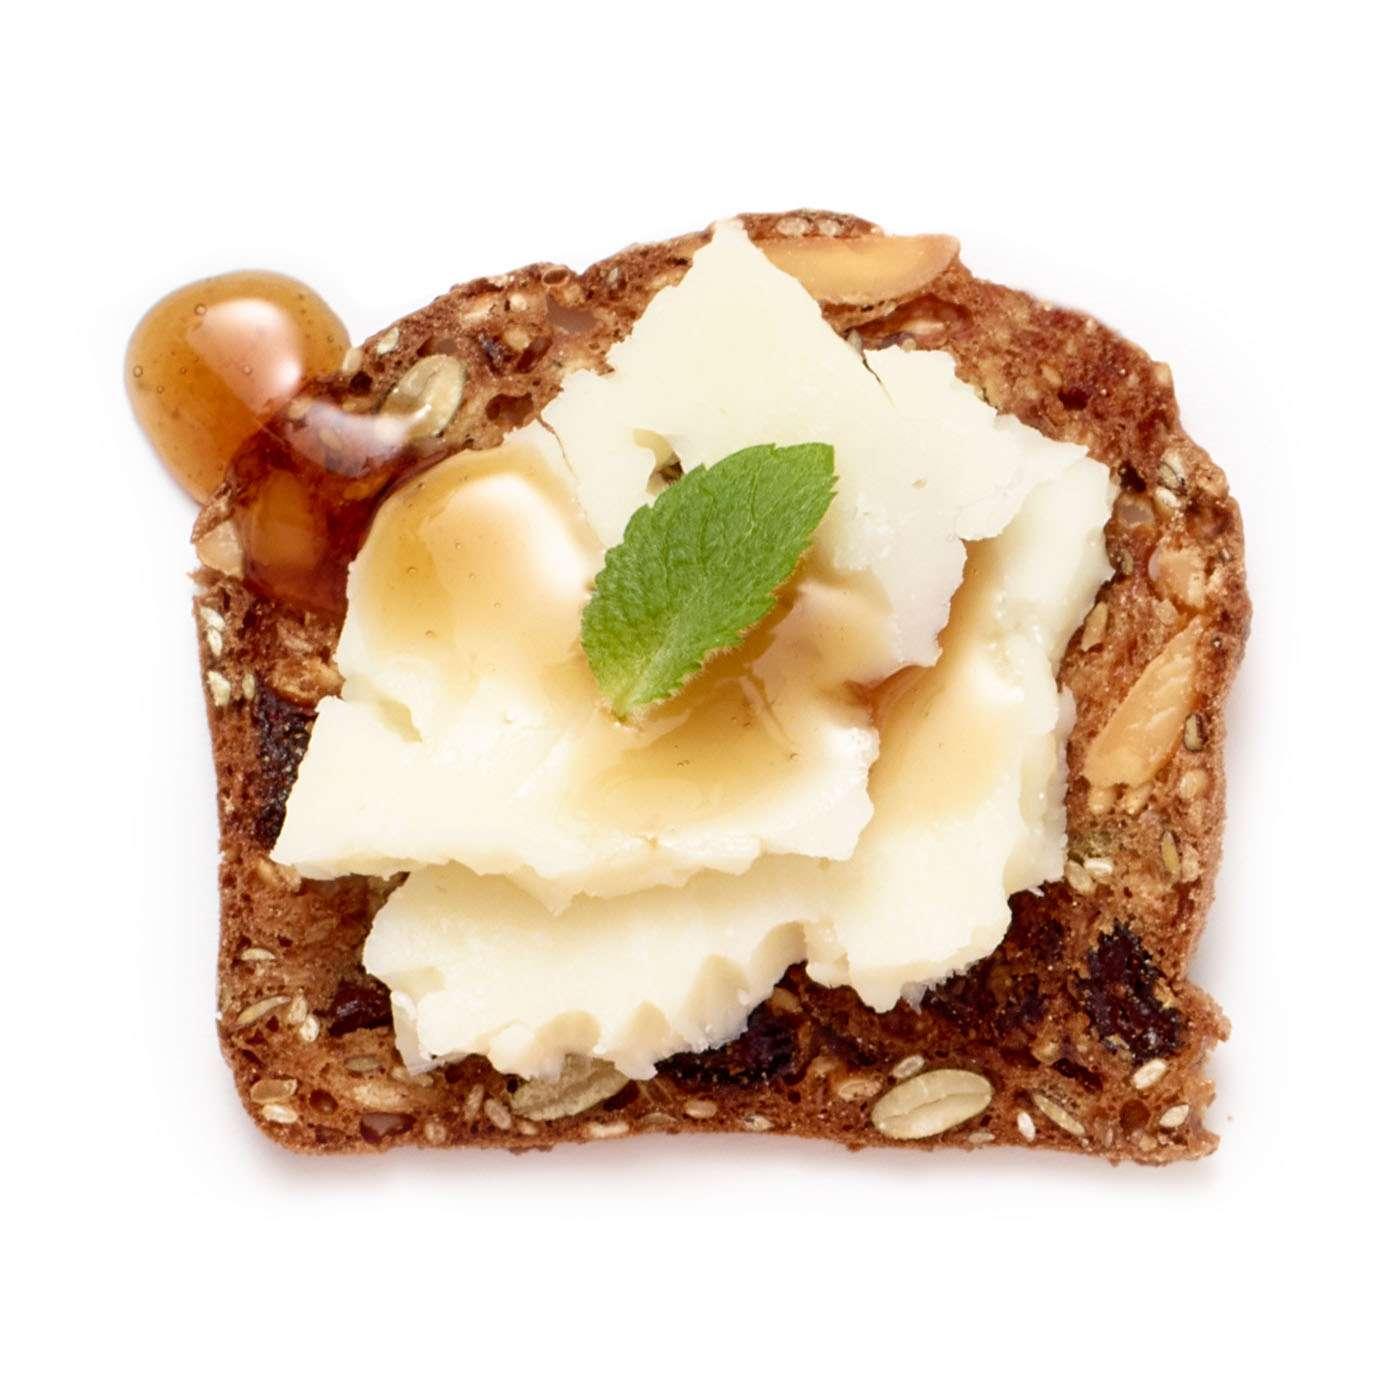 lesley stowe raincoast crisps® Salty Date and Almond